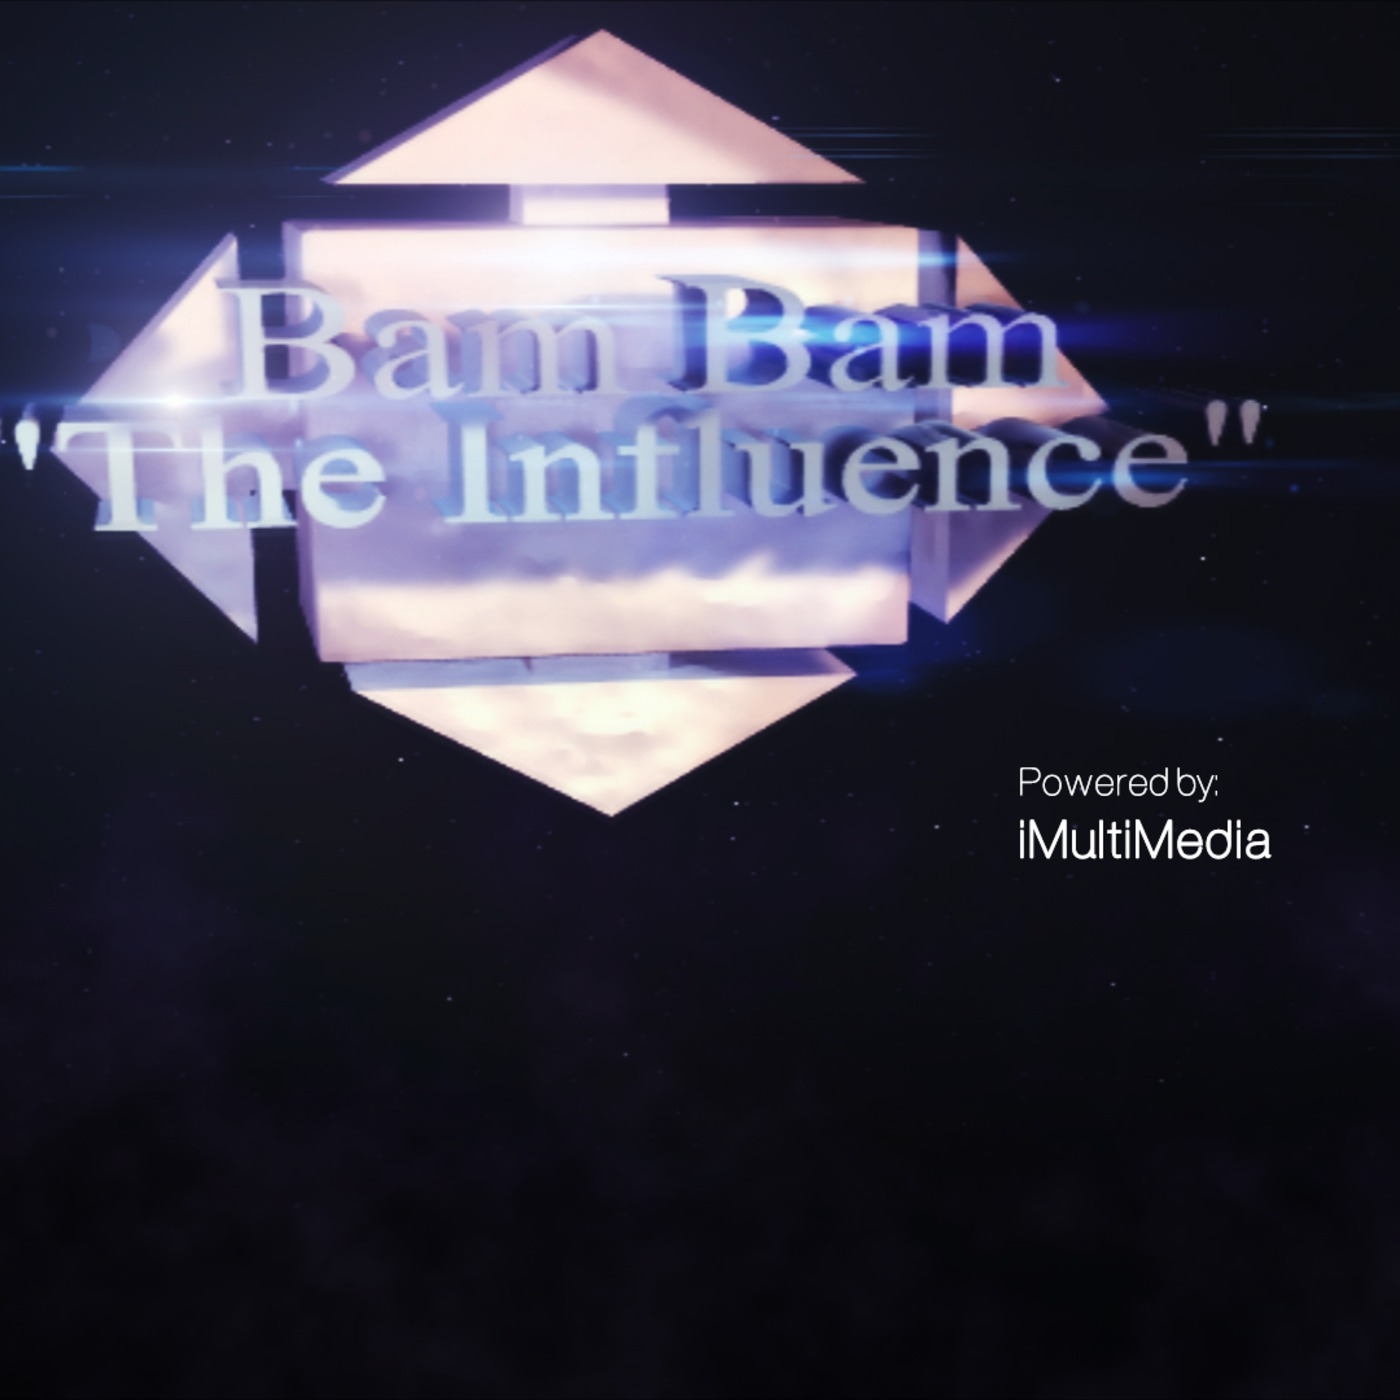 Bam Bam's Podcast